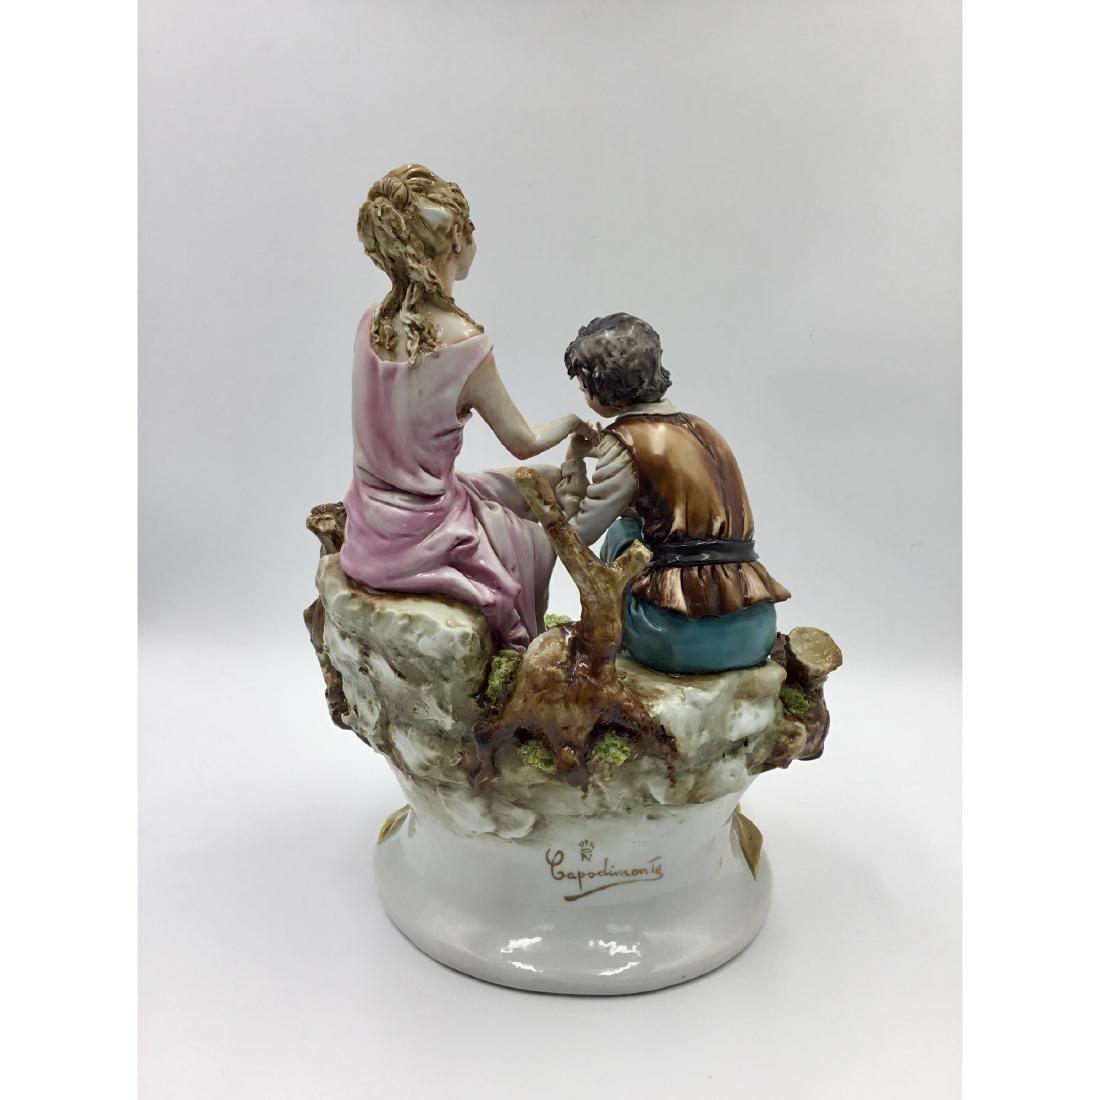 CAPODIMONTE LARGE PORCELAIN MAN & WOMAN FIGURINE - 3